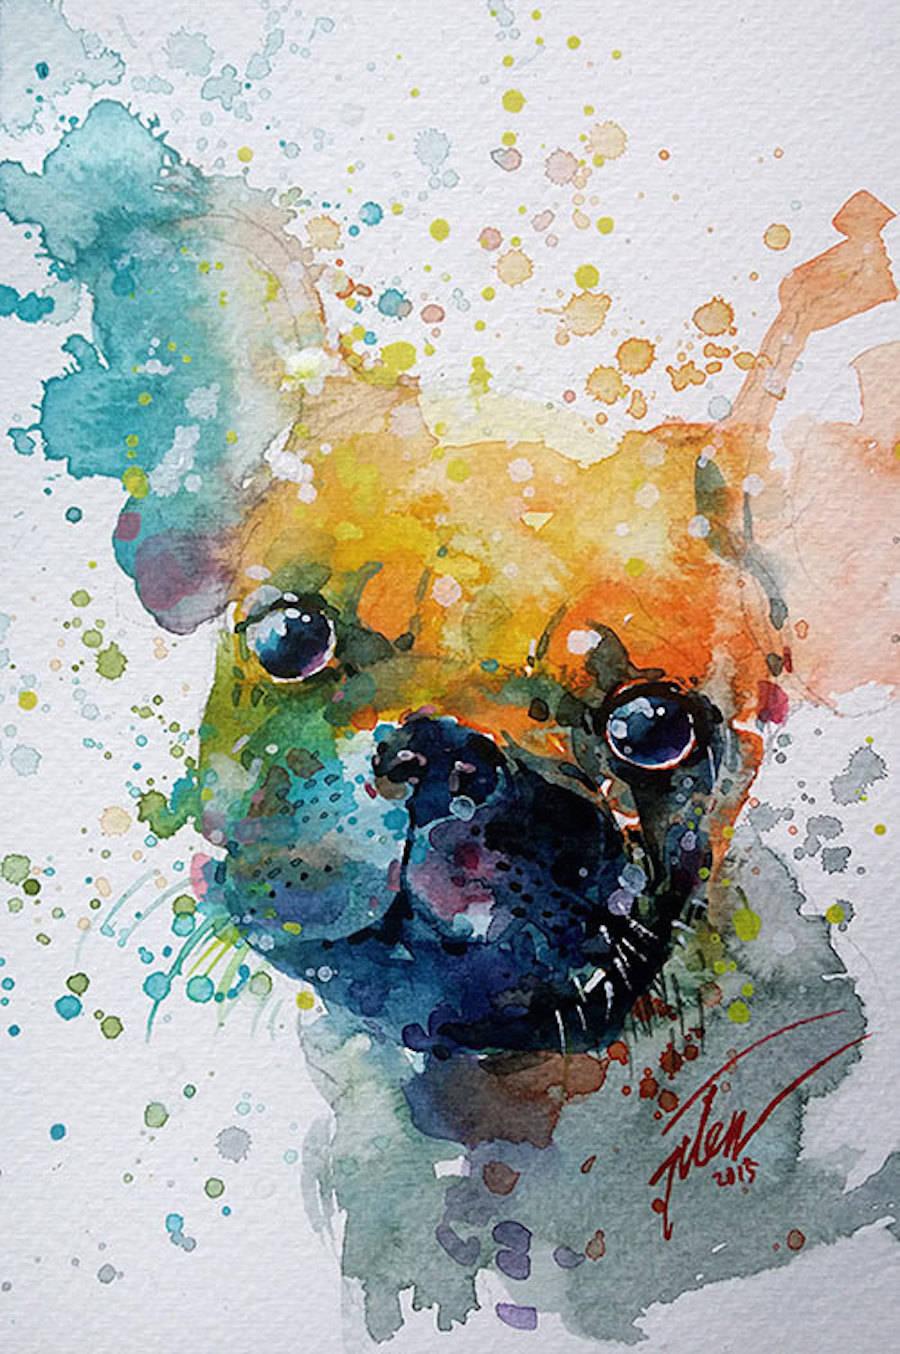 Colorful Splashed Watercolor Animals Paintings – Fubiz Media